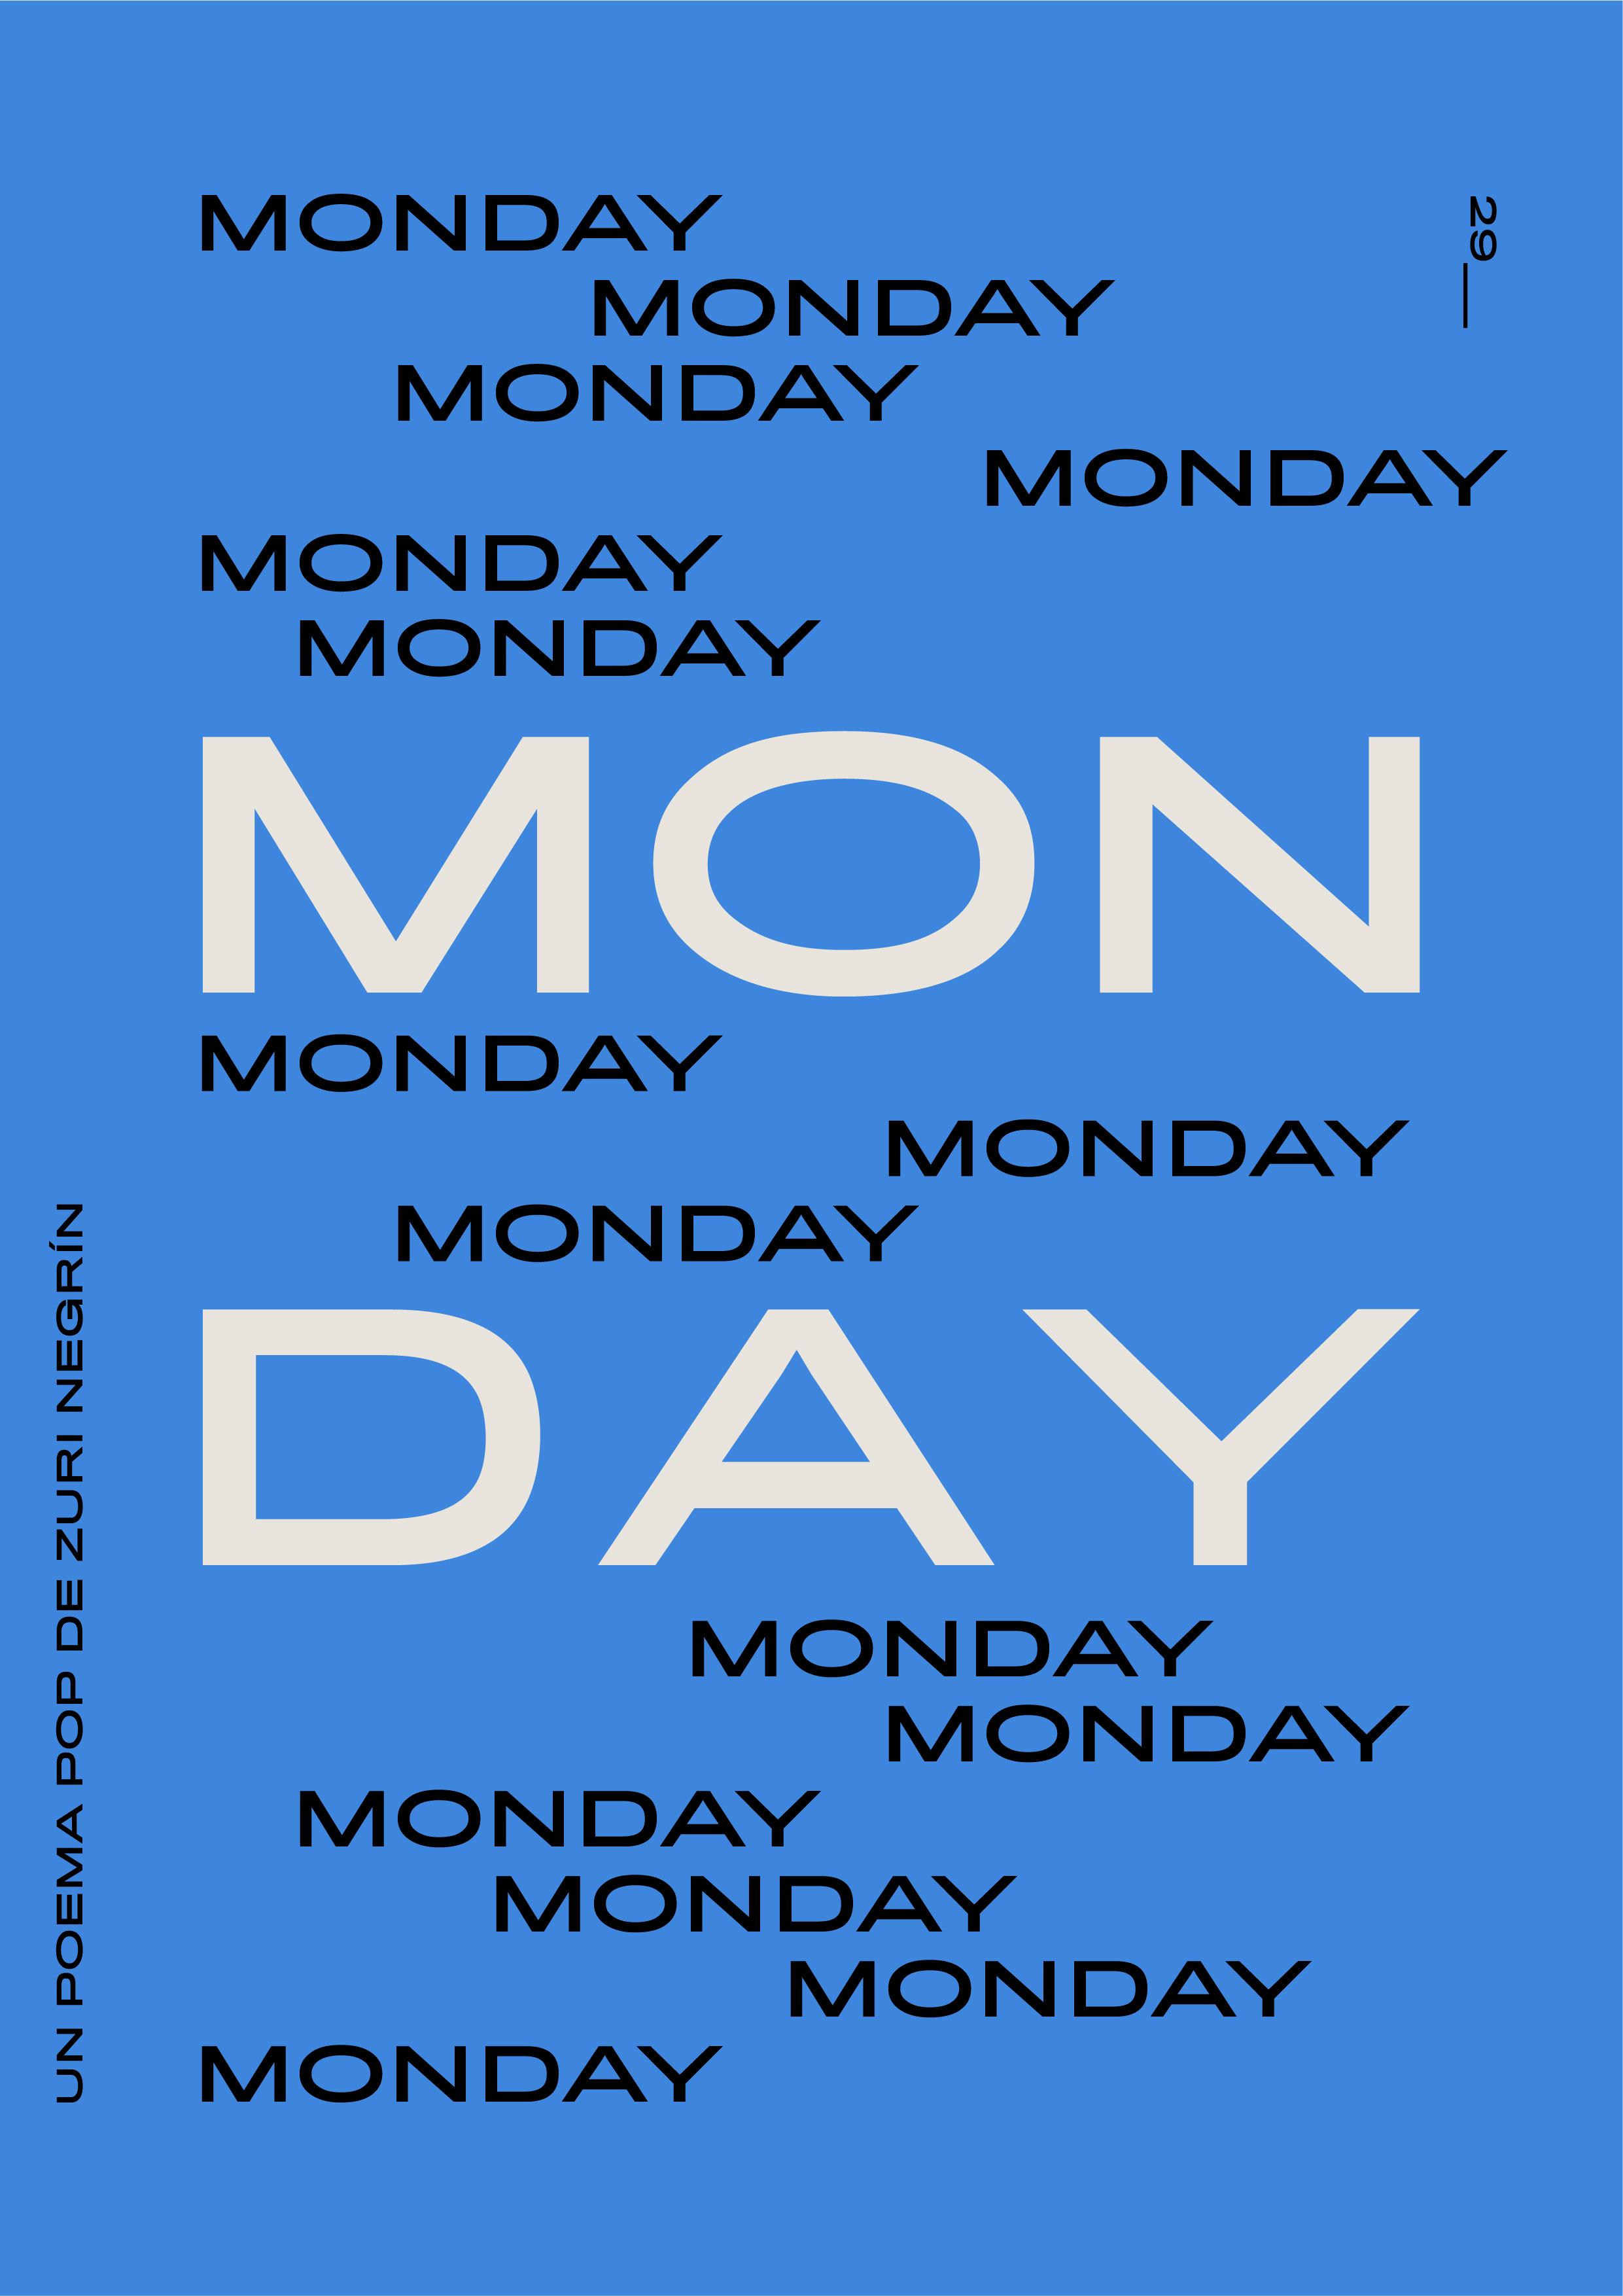 POP_29 Monday